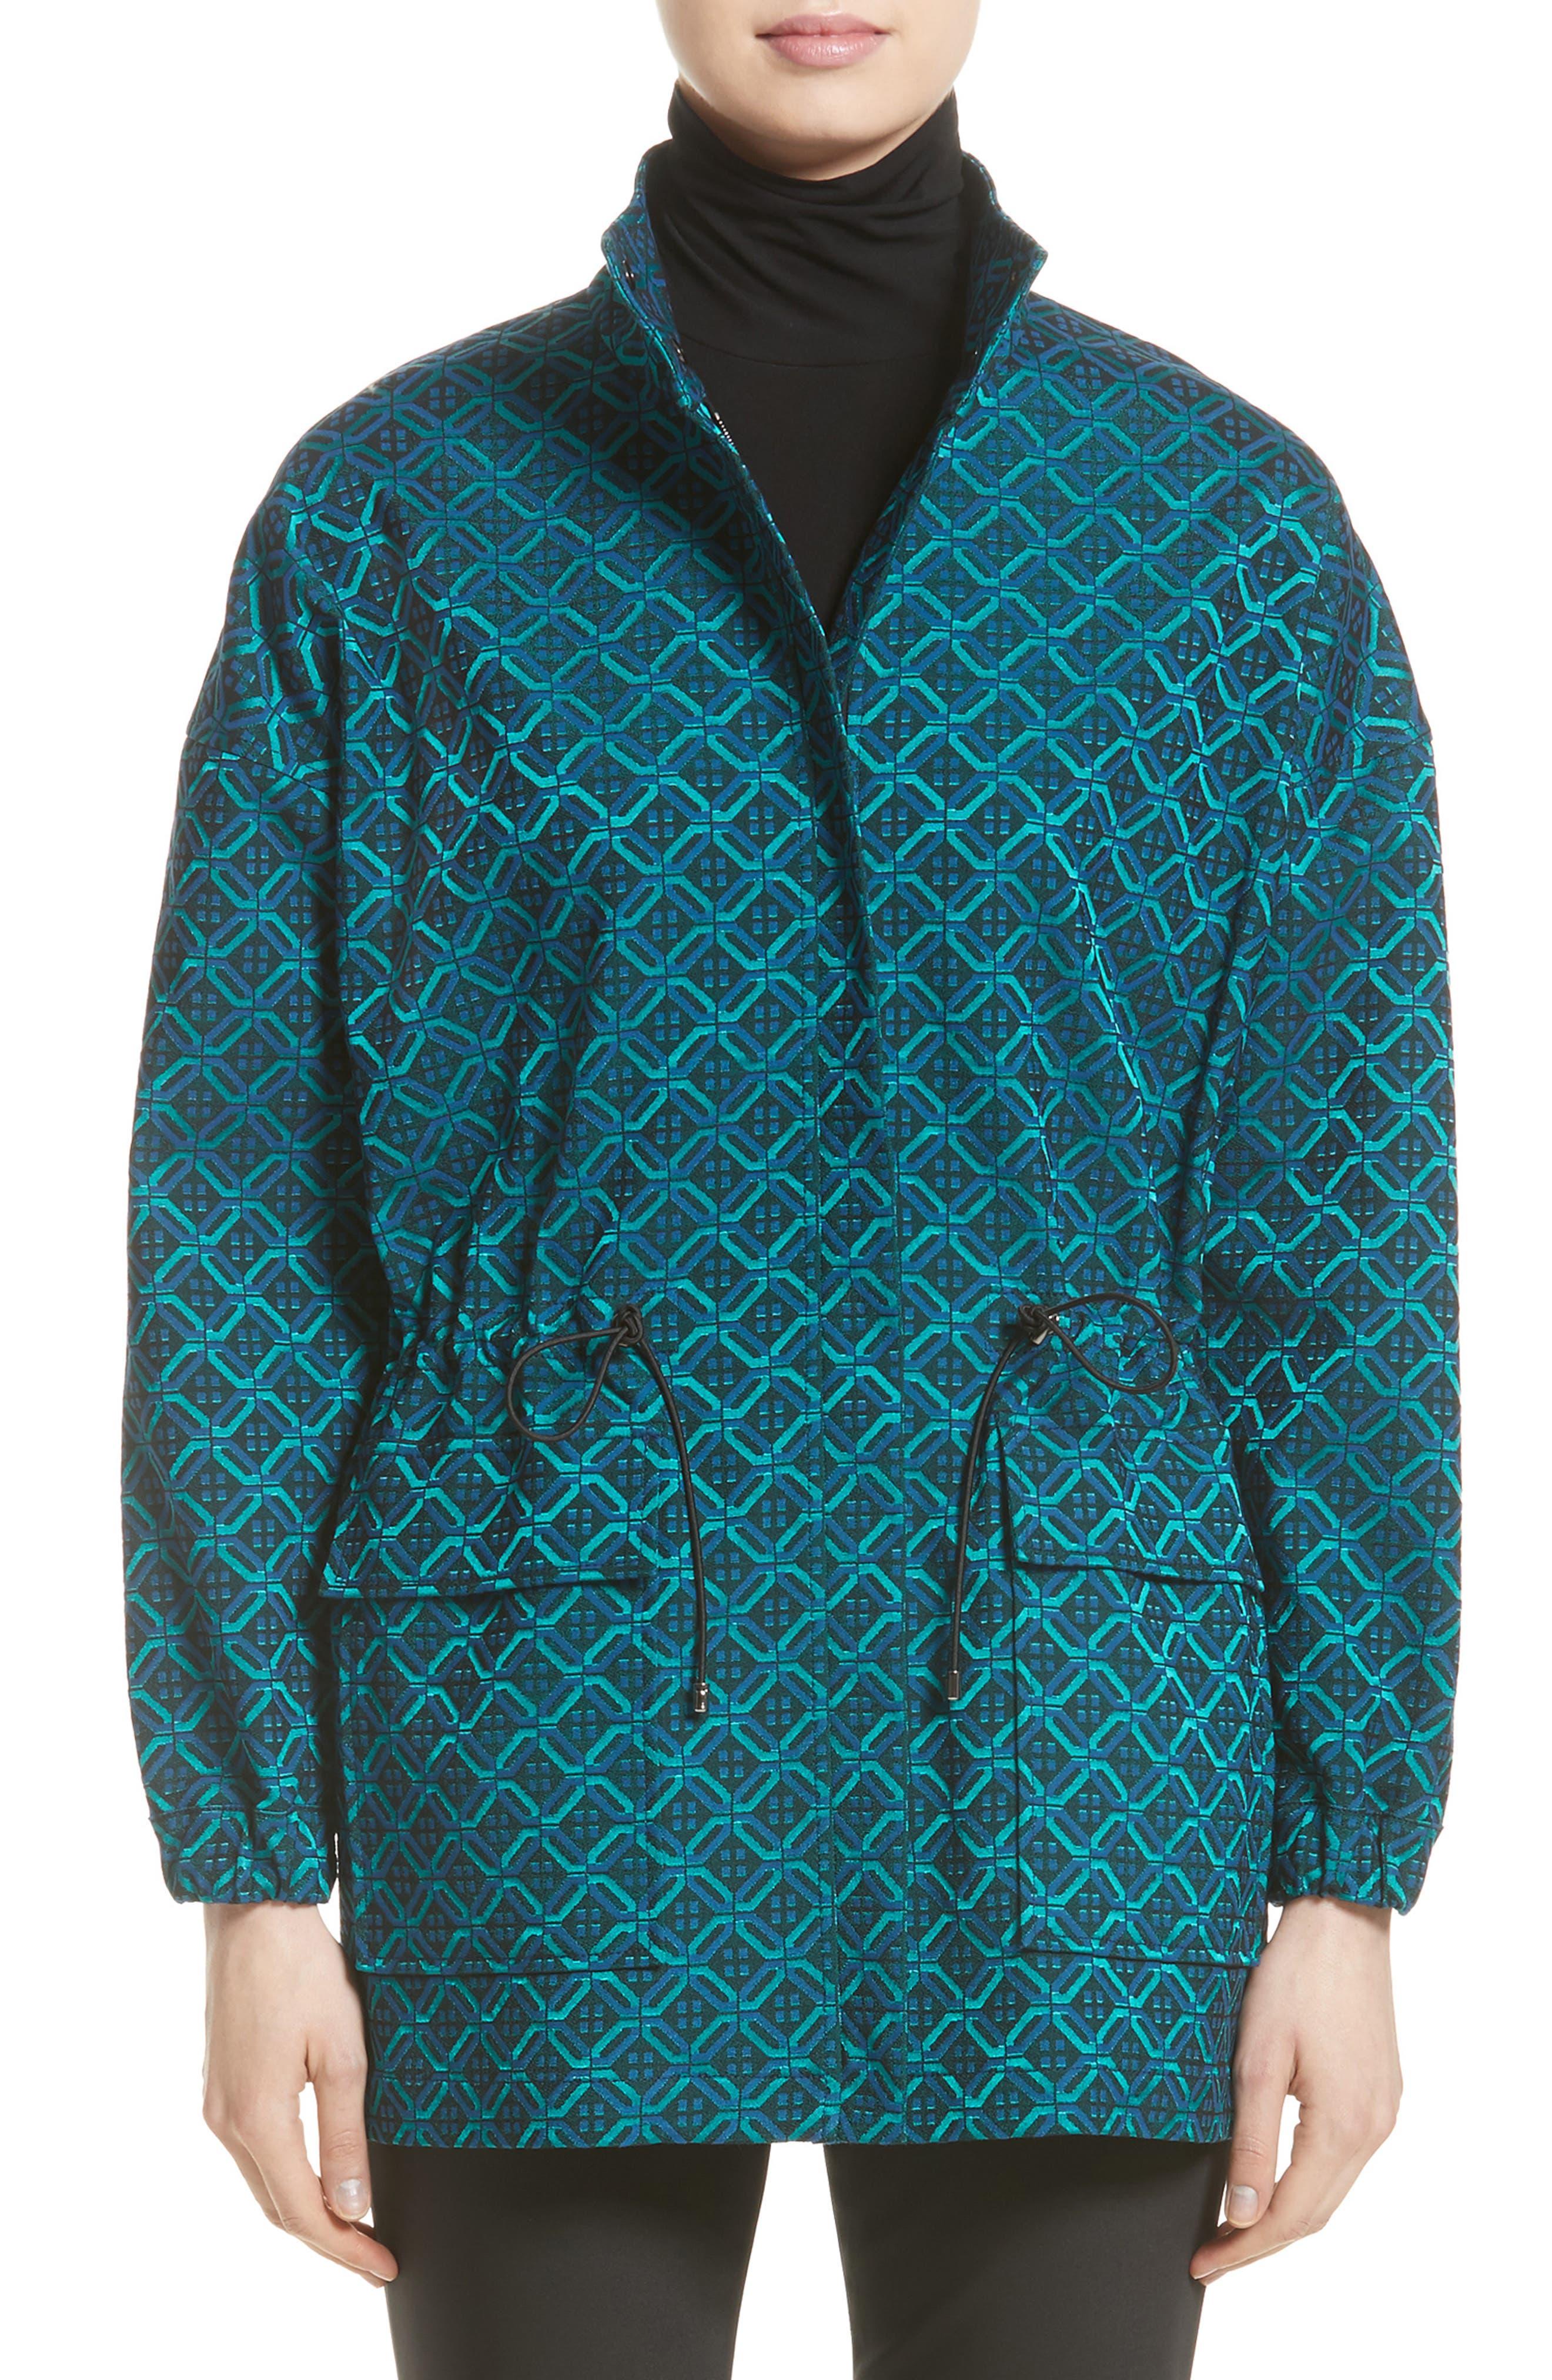 Main Image - St. John Collection Tile Jacquard Funnel Neck Jacket